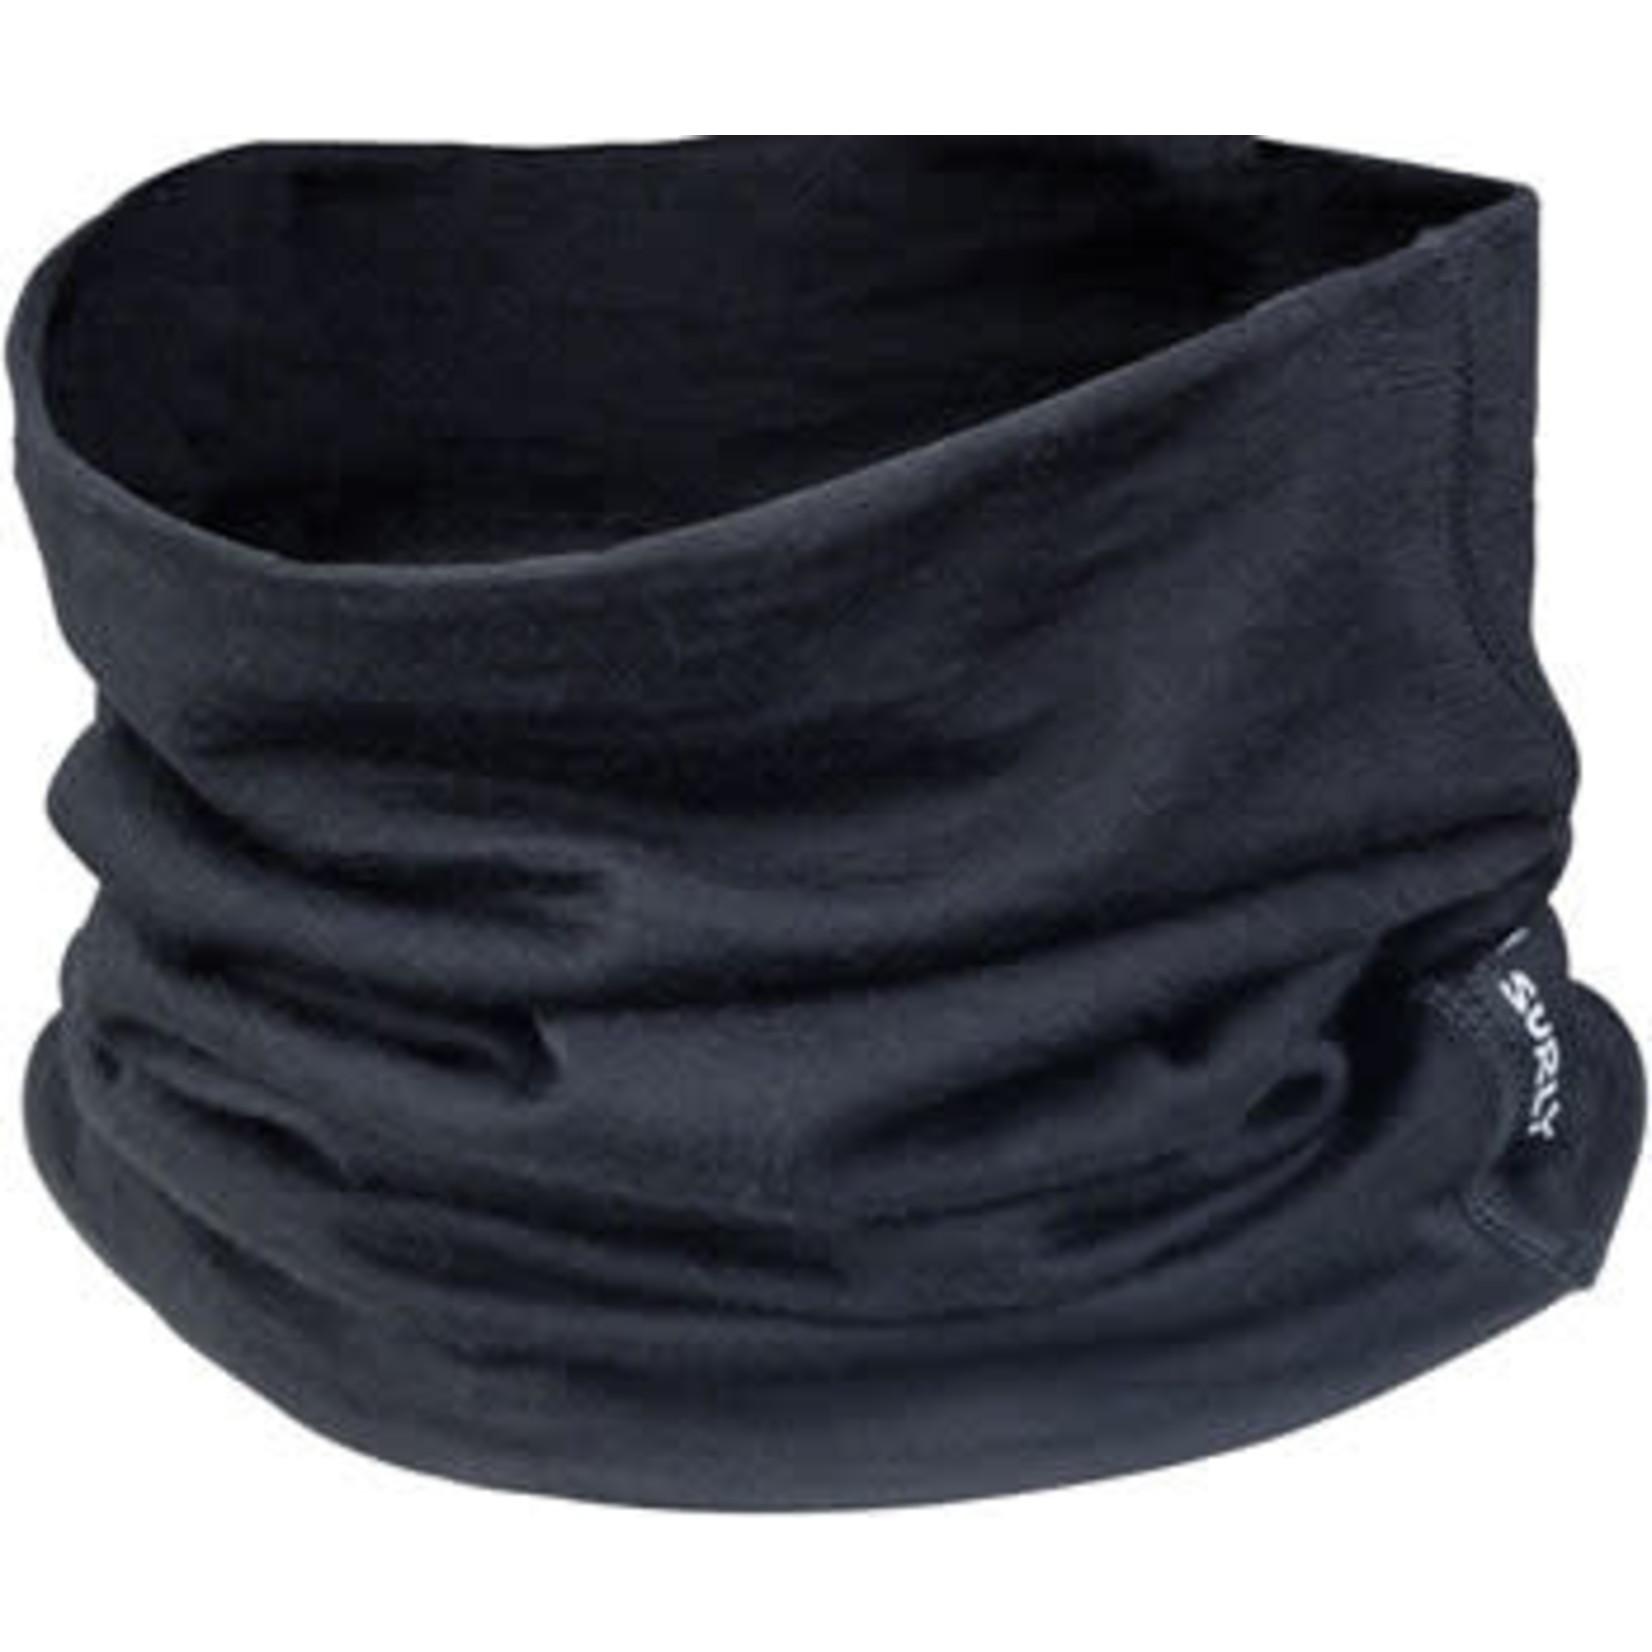 Surly Surly Lightweight Neck Toob One Size Black